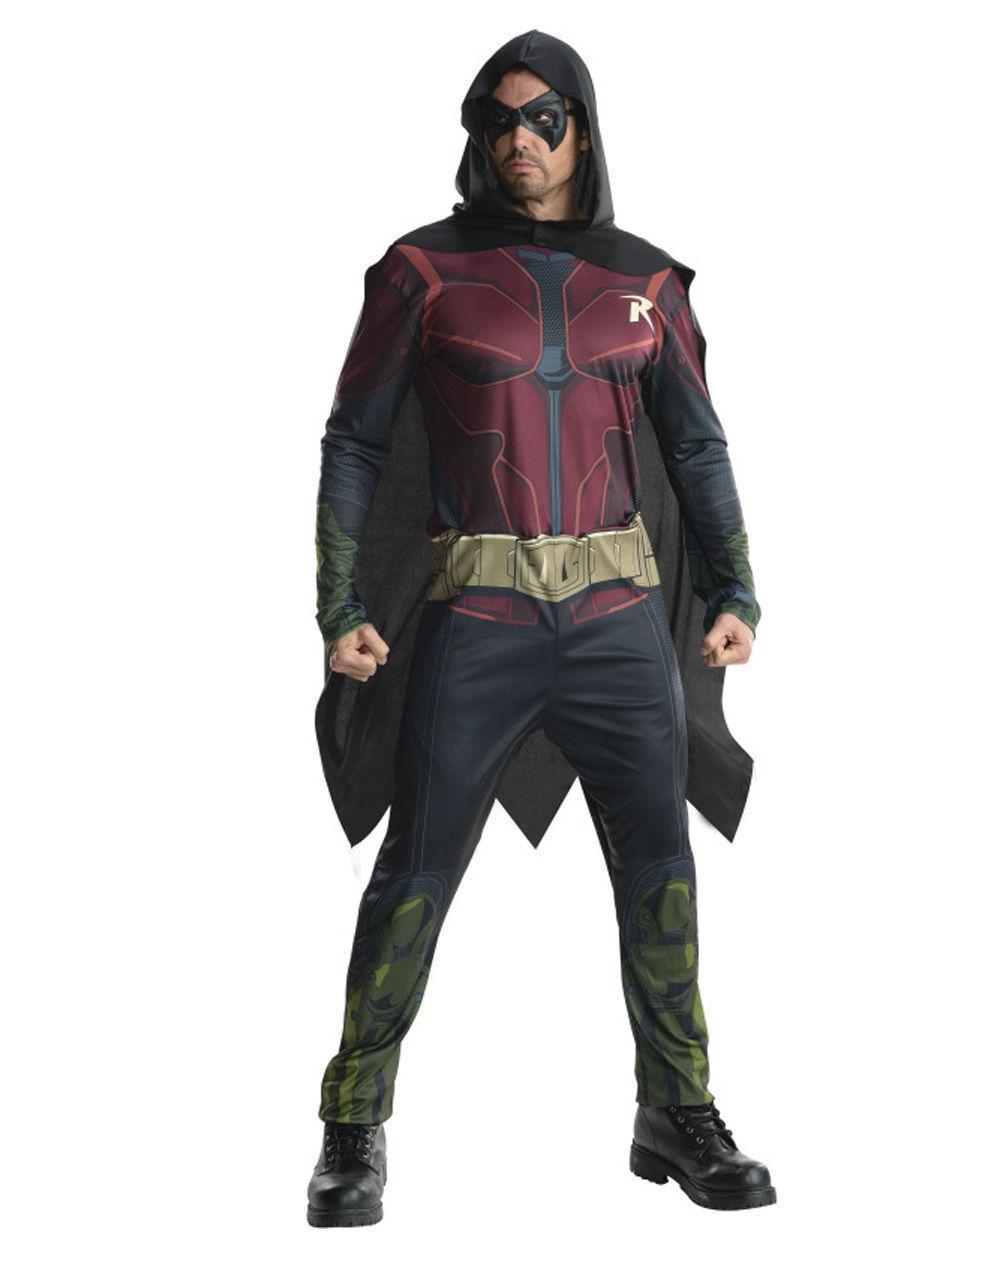 Robin Costume, Mens Arkham City Outfit, XL,CHEST 44-46 ,WAIST 36-40 ,INSEAM 33  | Zuverlässiger Ruf